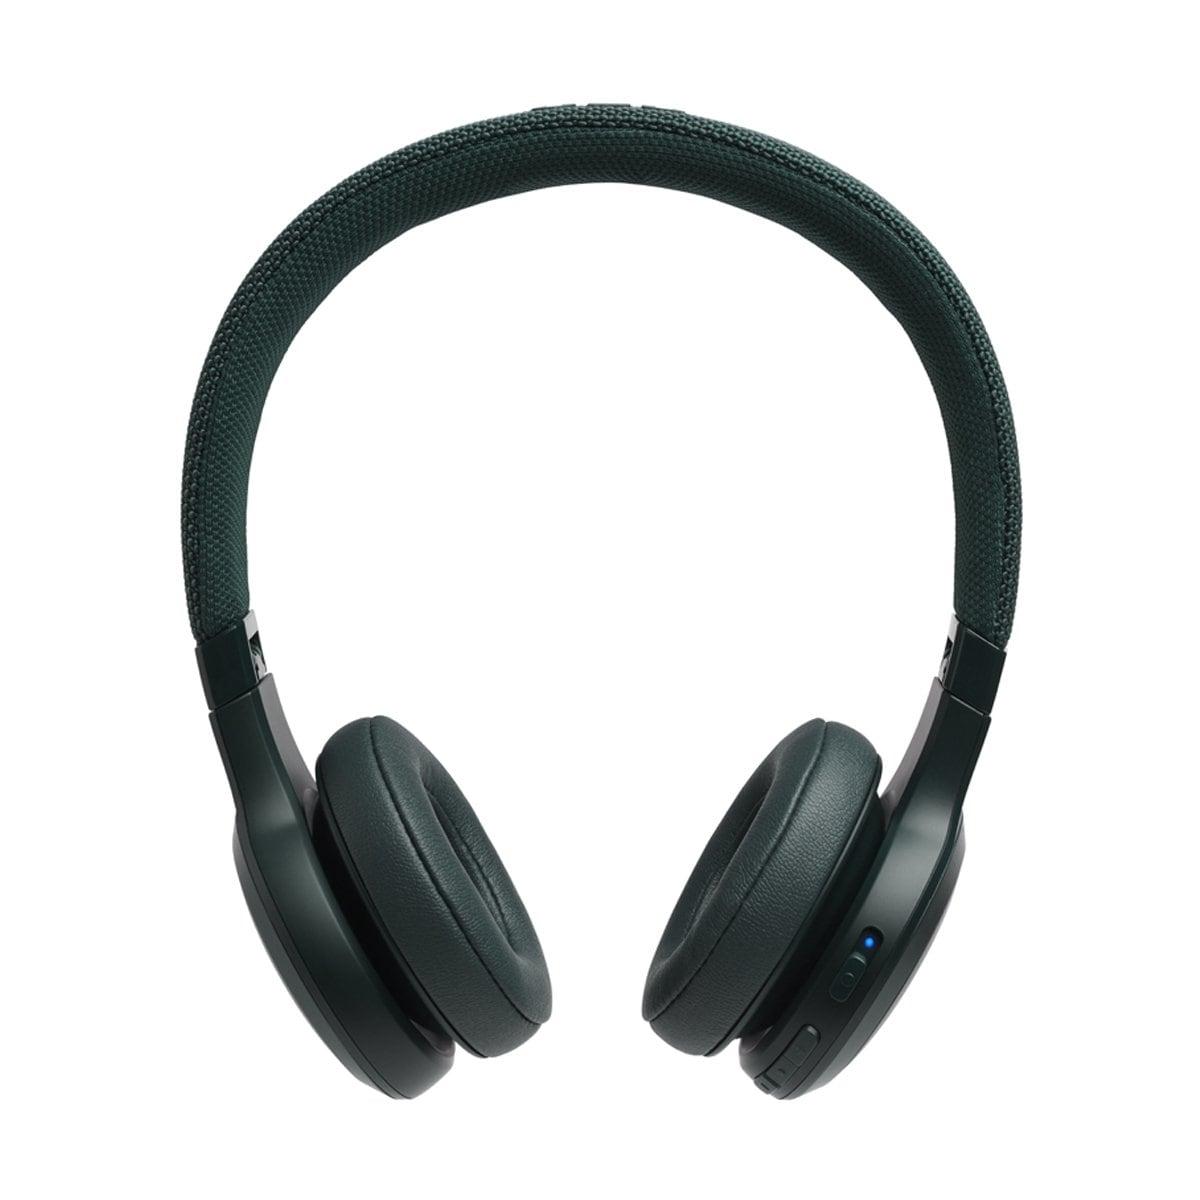 Audífonos Over Ear Inalámbricos Live 400 Verde Jbl